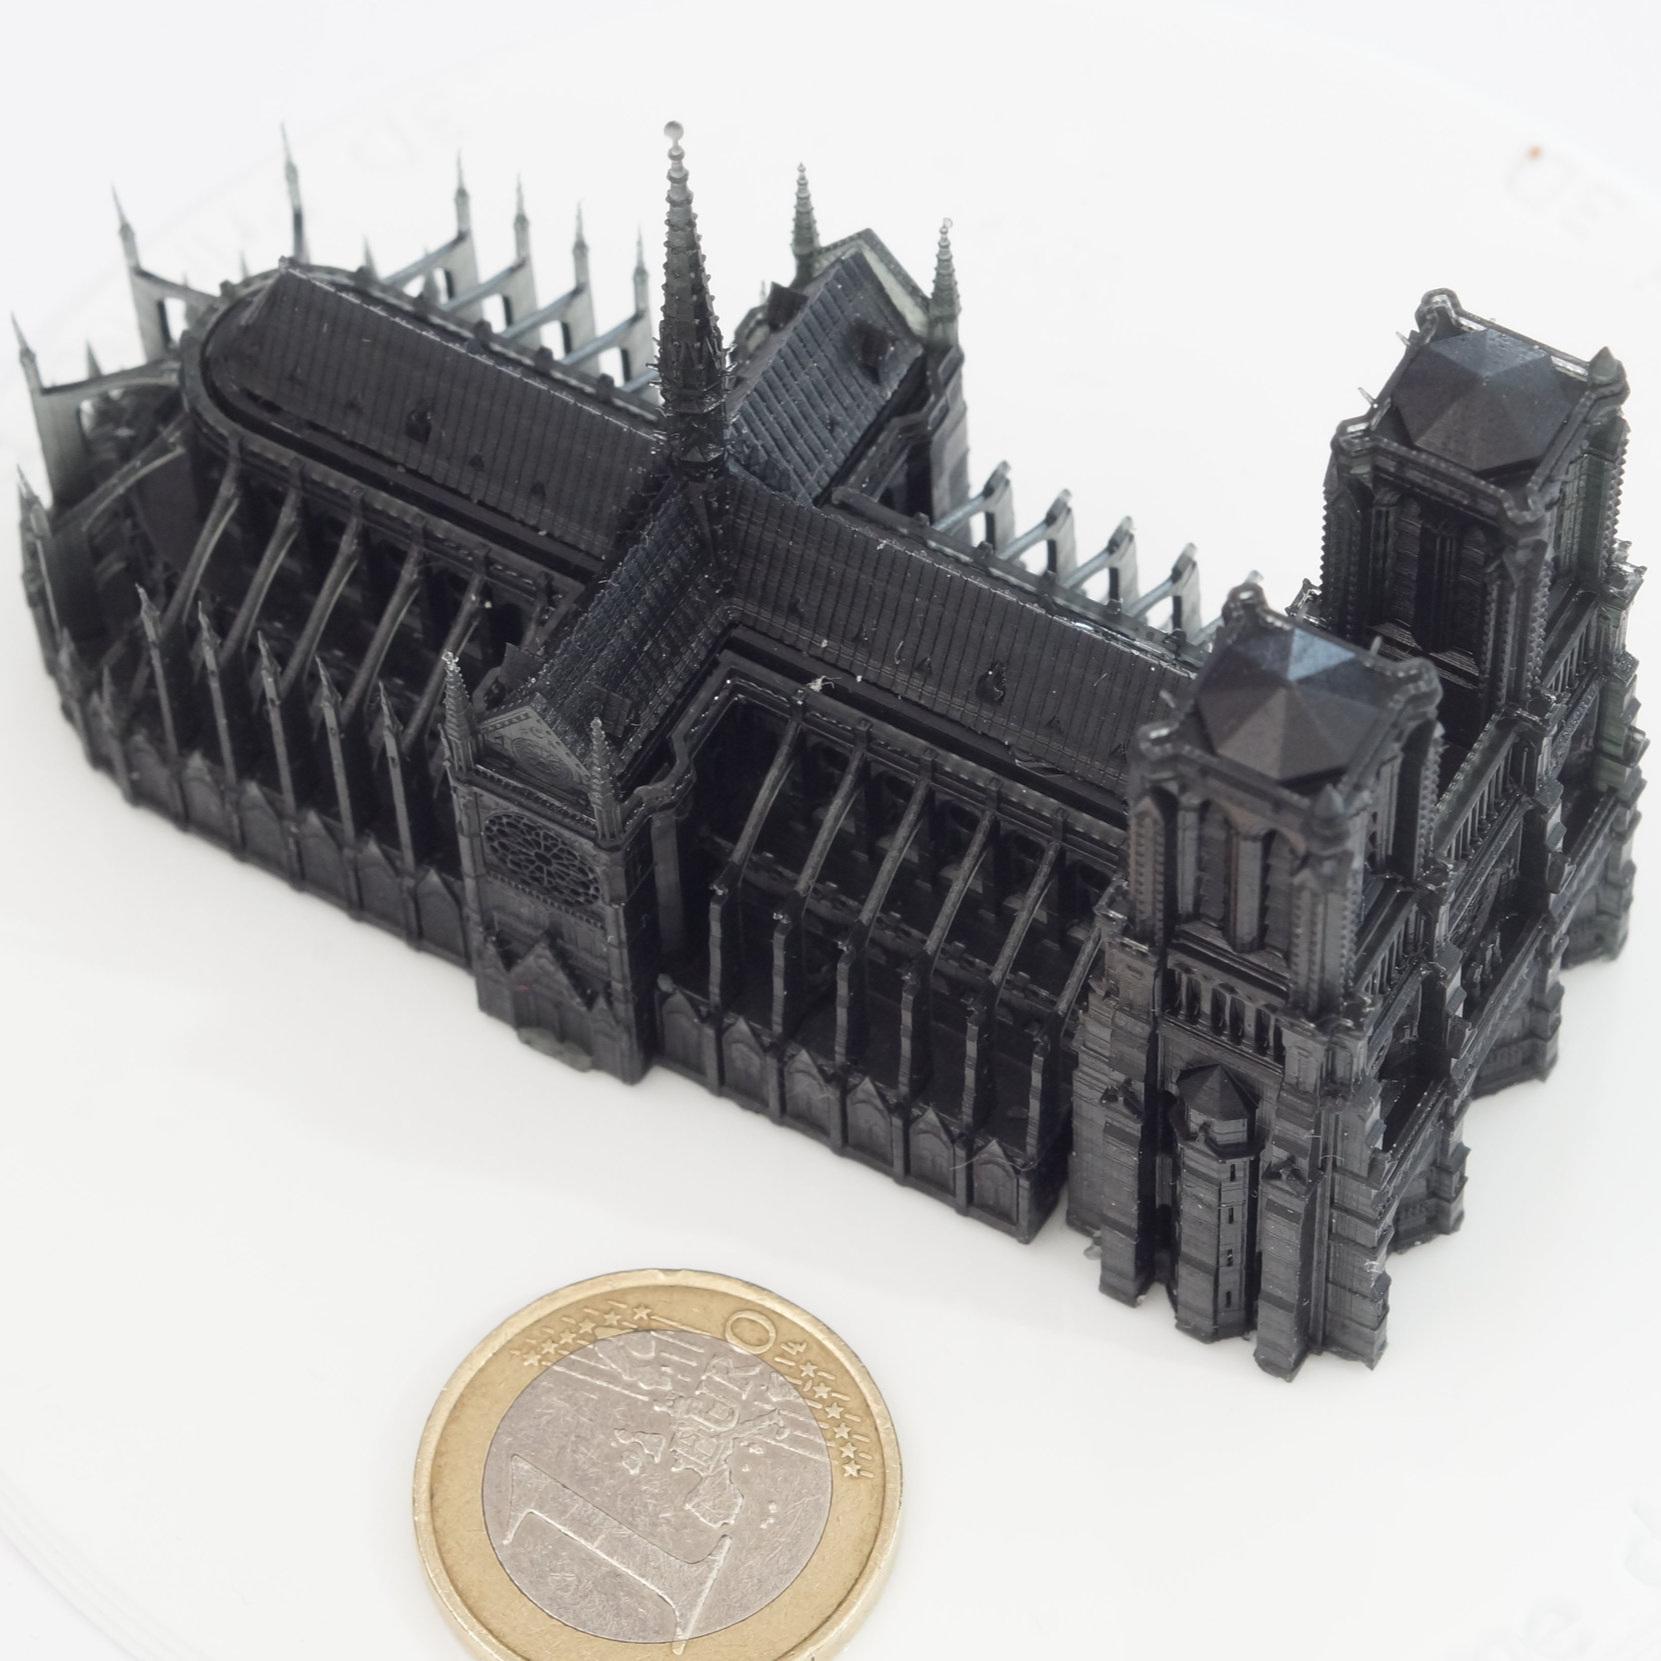 Harzlabs Model resin -